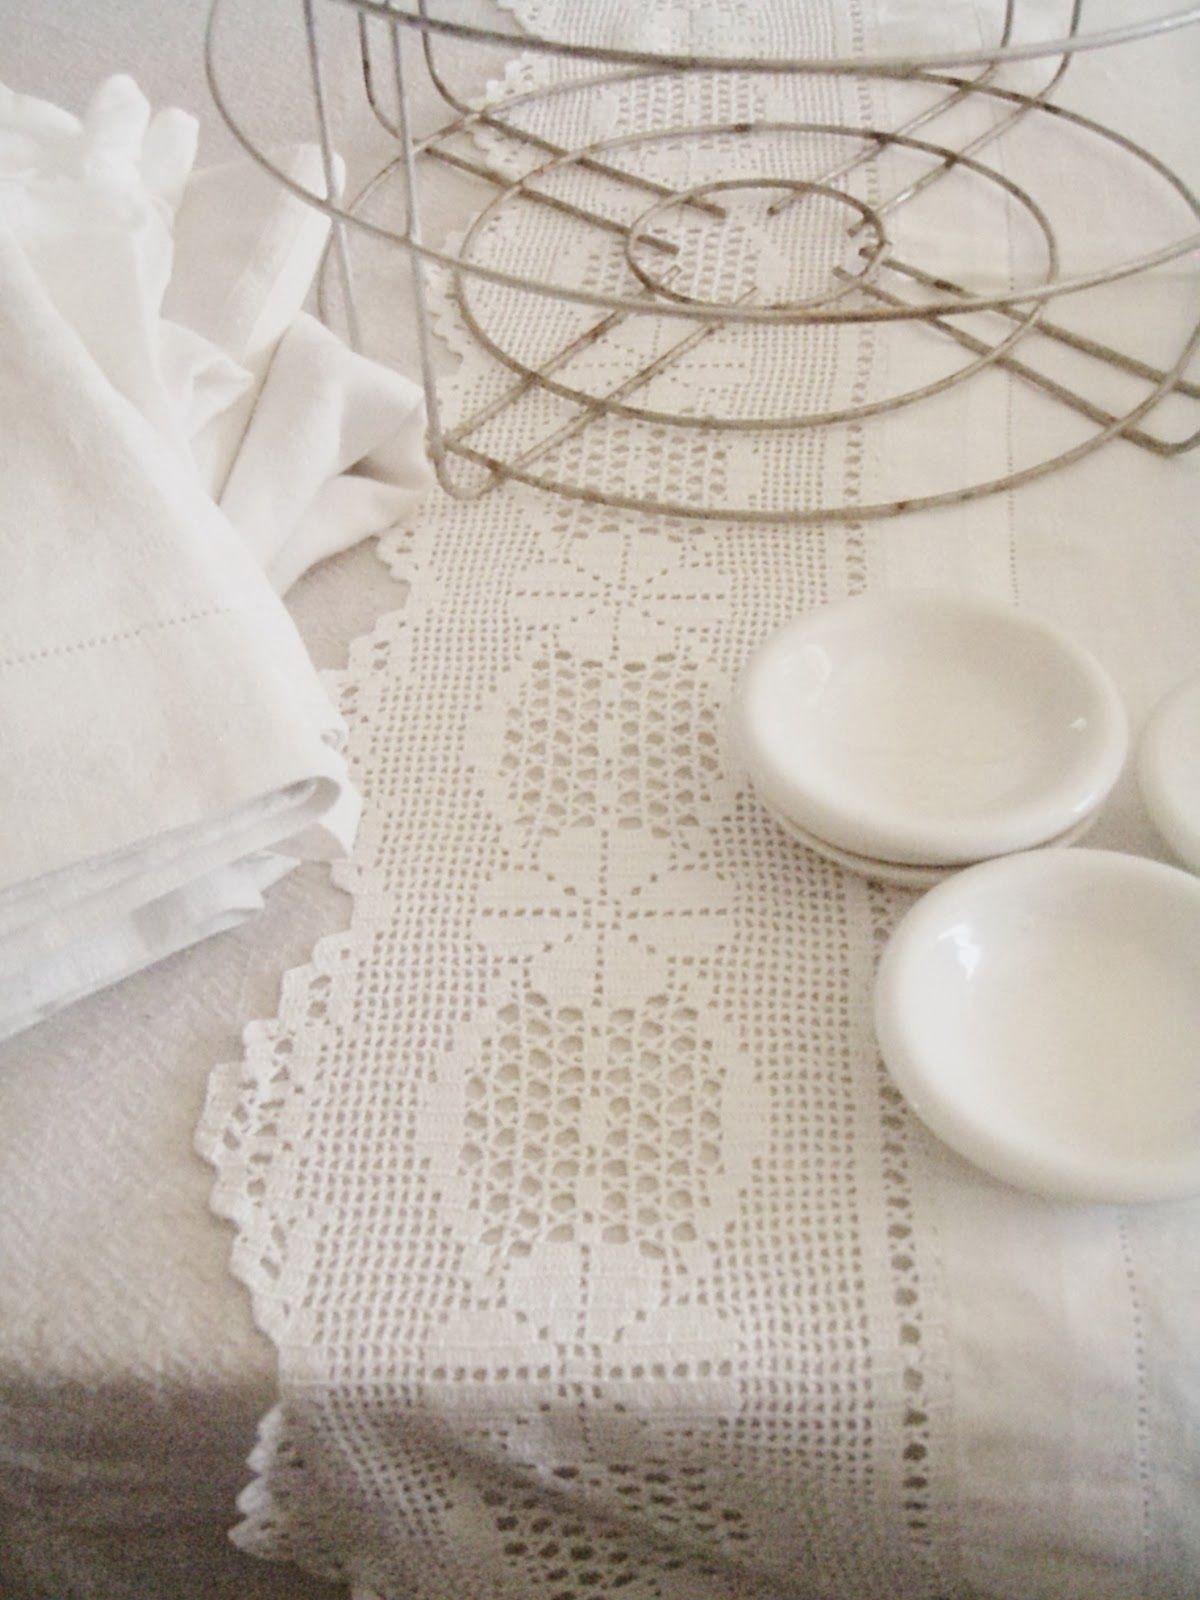 Cabin & Cottage : Simple White Things | Örgü modelleri | Pinterest ...